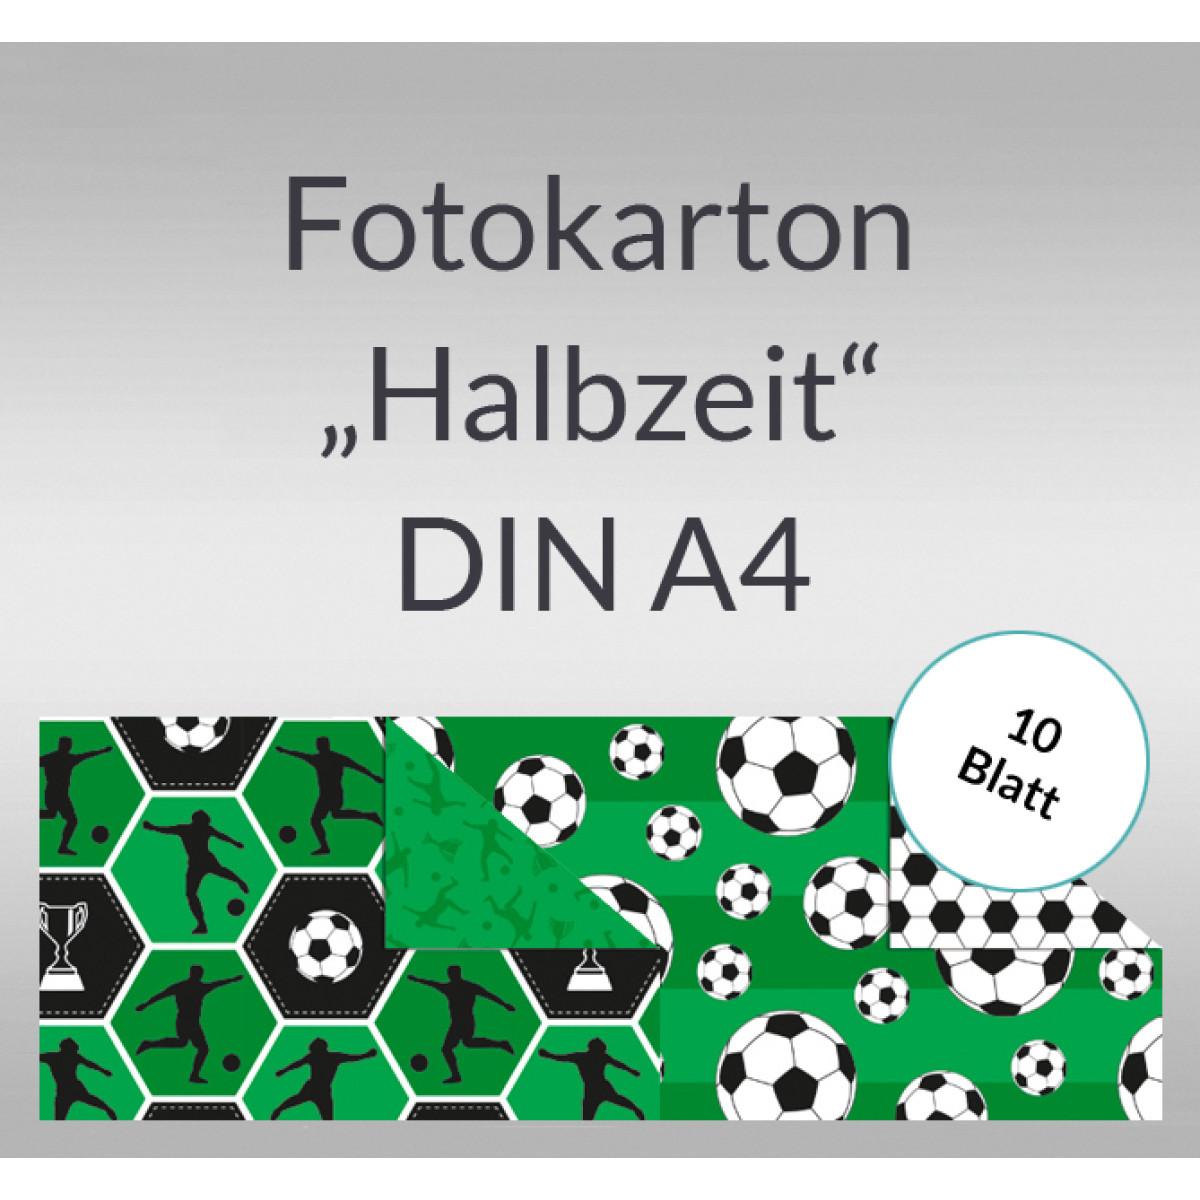 "Fotokarton ""Halbzeit"" DIN A4 - 10 Blatt"